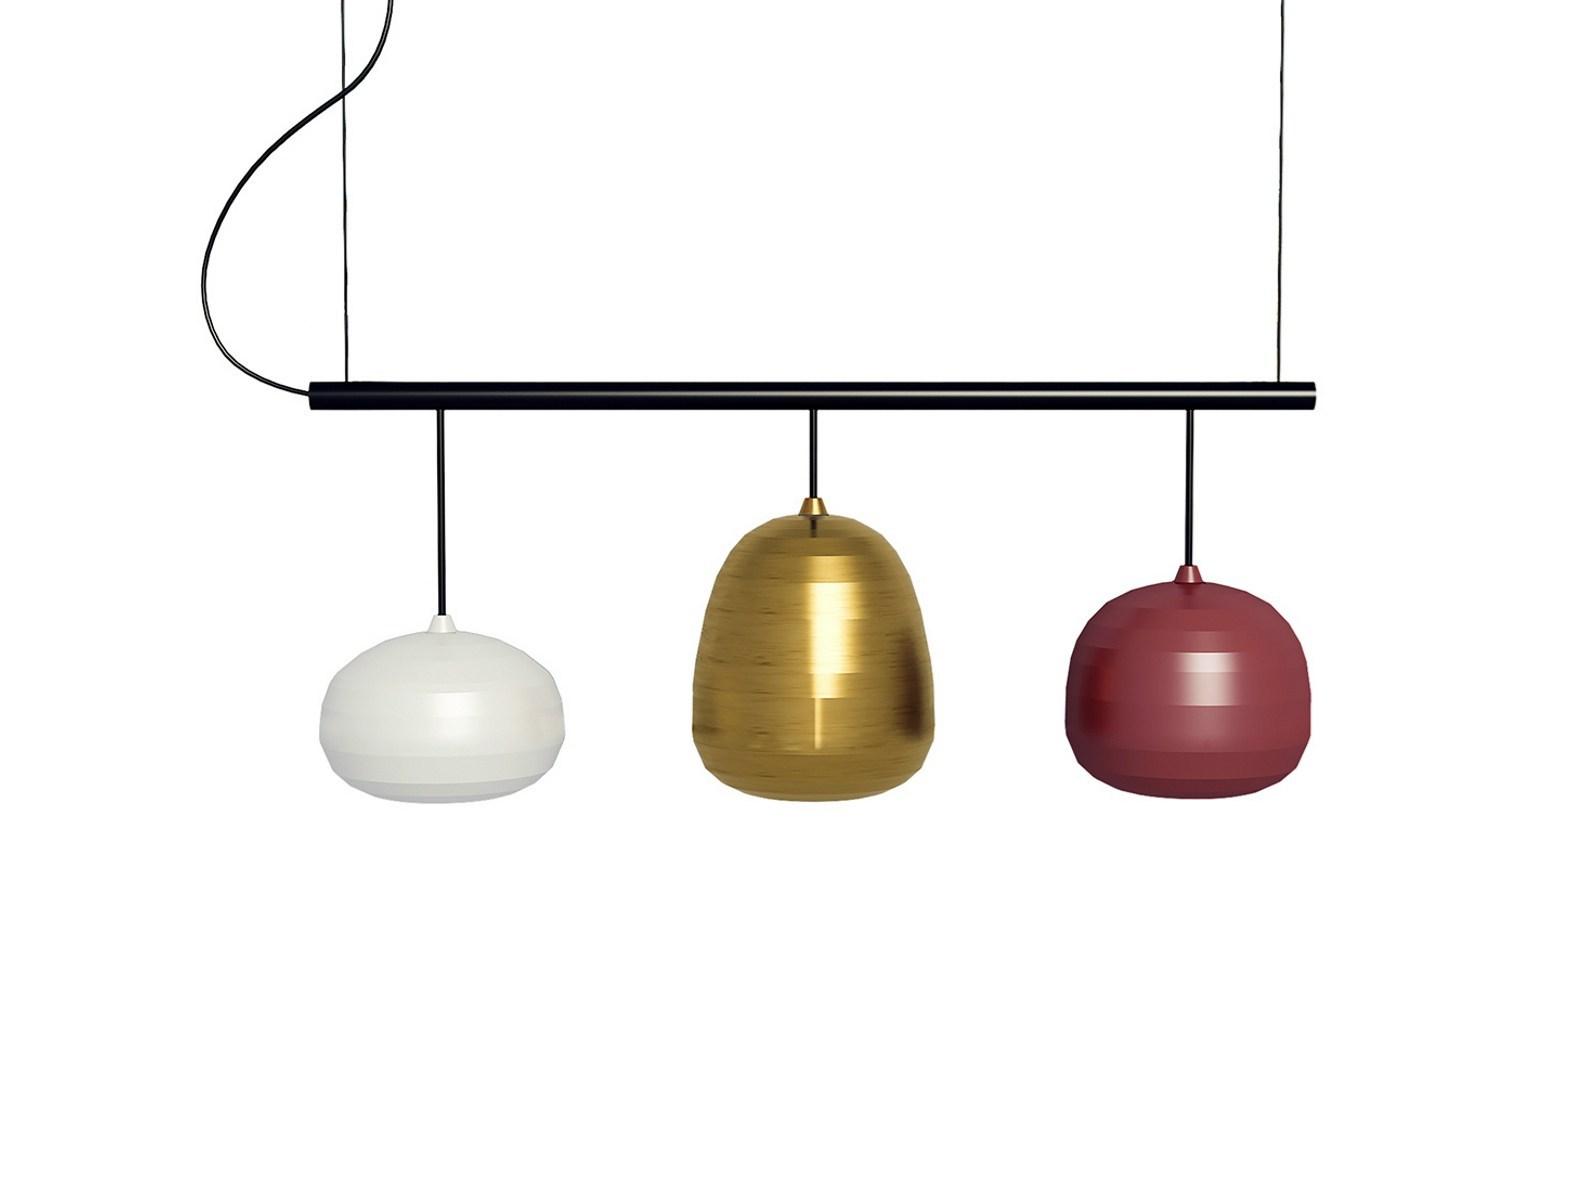 Pomi Pendant Lamp by Luca Nichetto for Zero Lighting